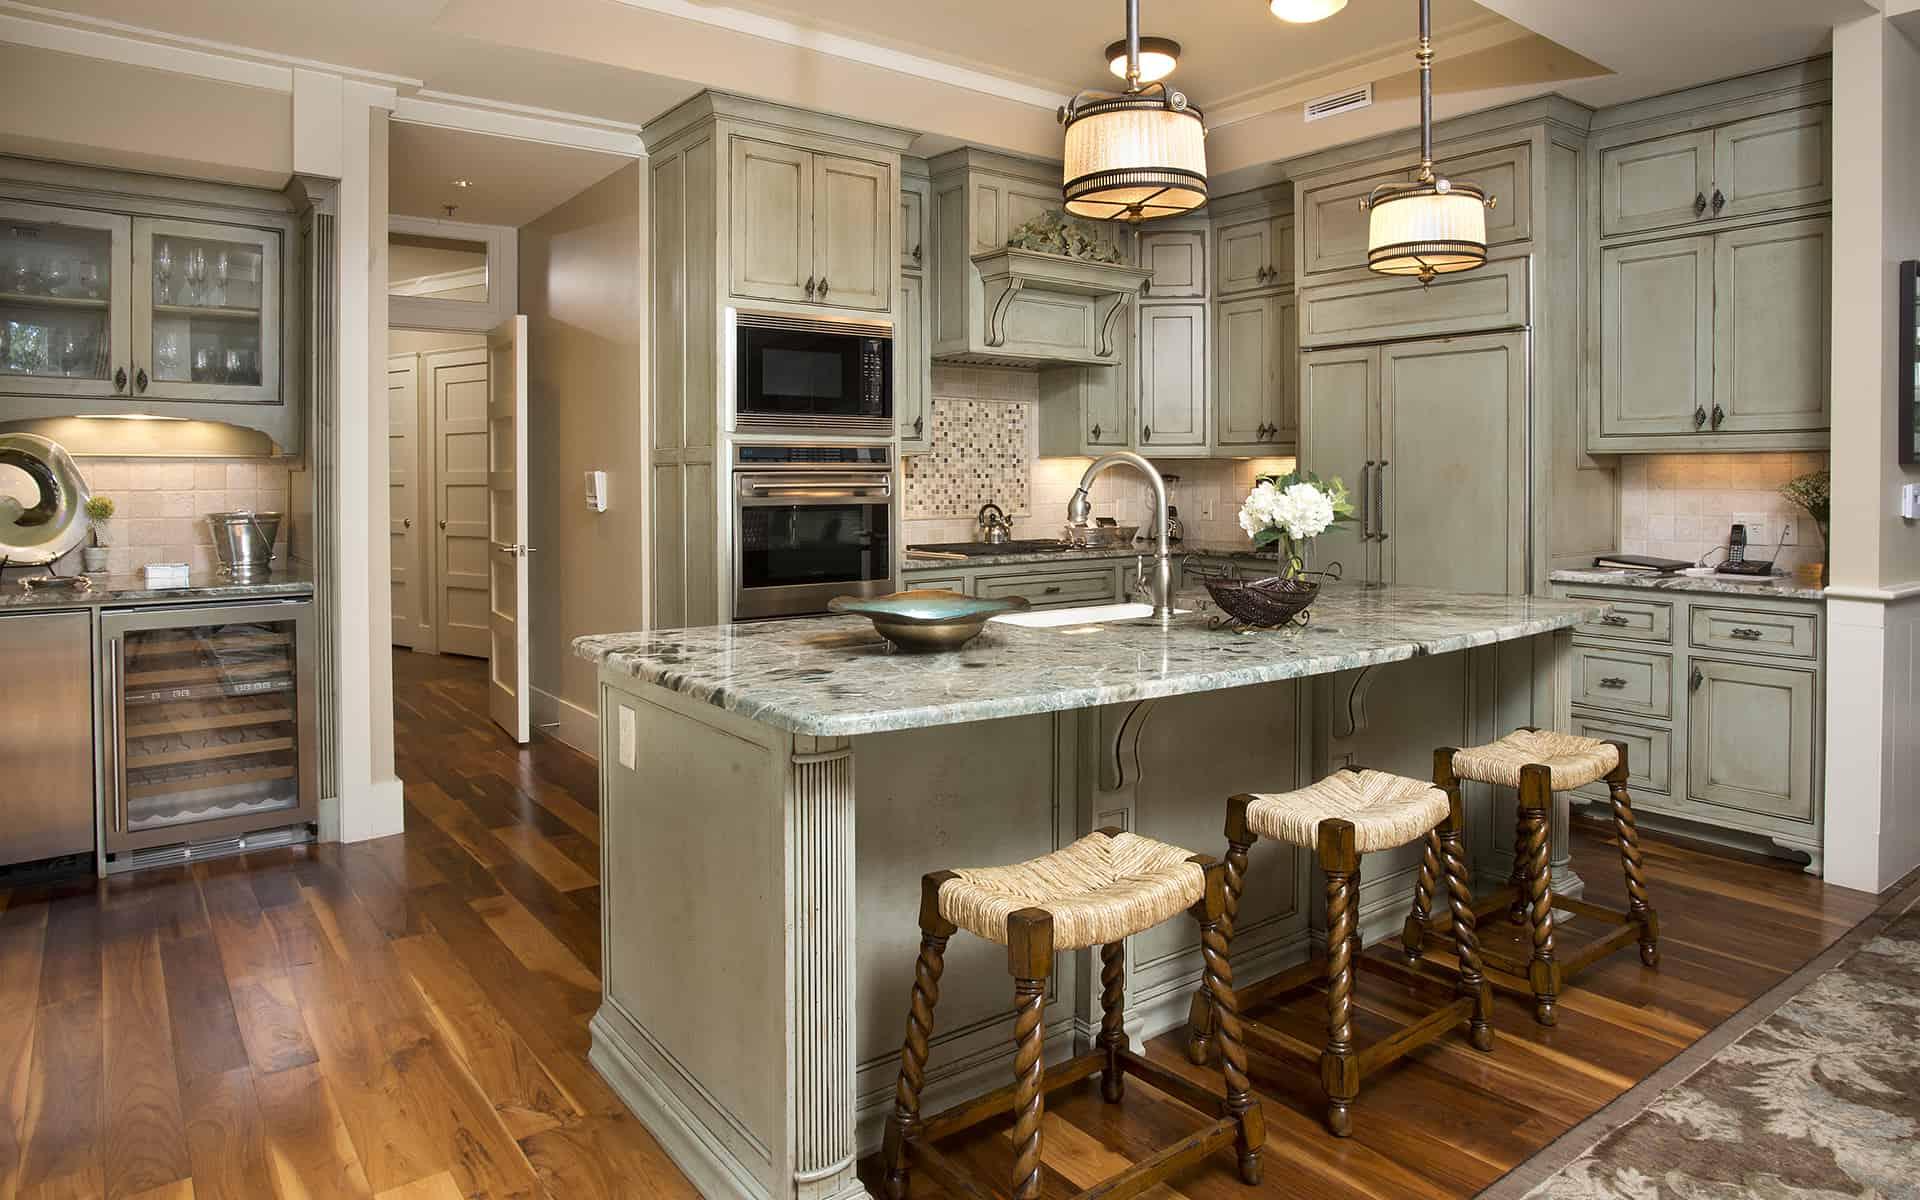 South Carolina Resort Rooms & Suites Gallery